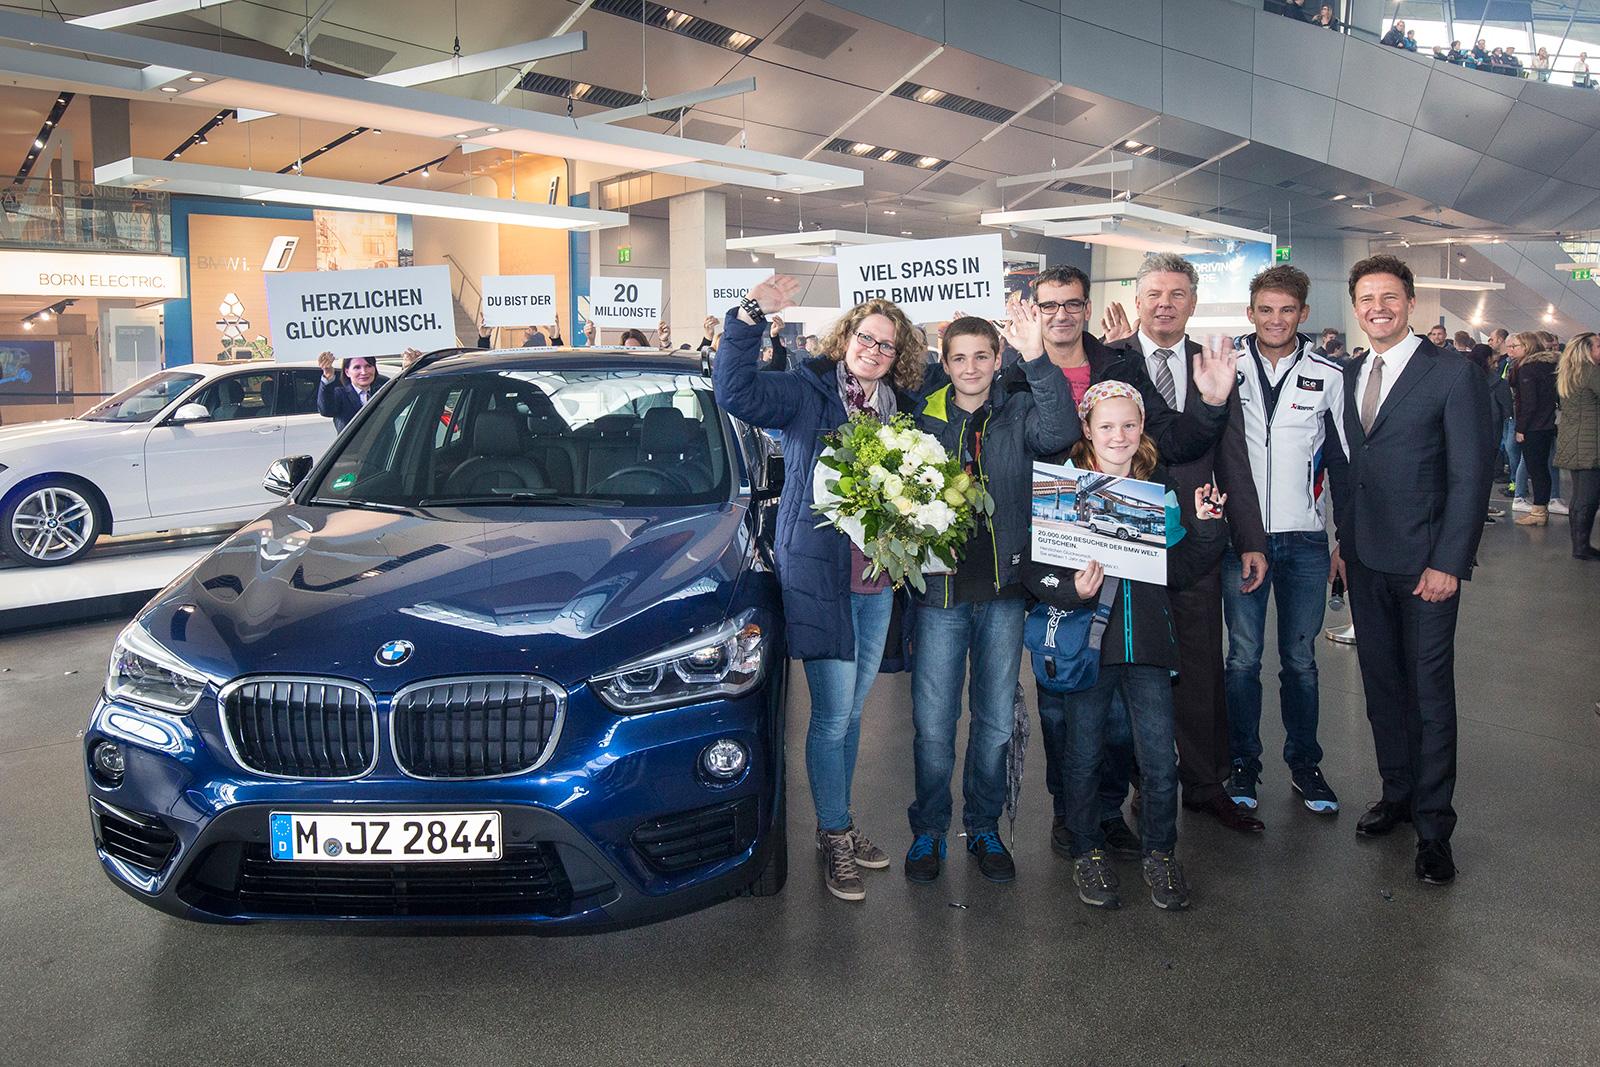 BMW Welt Visitor X1